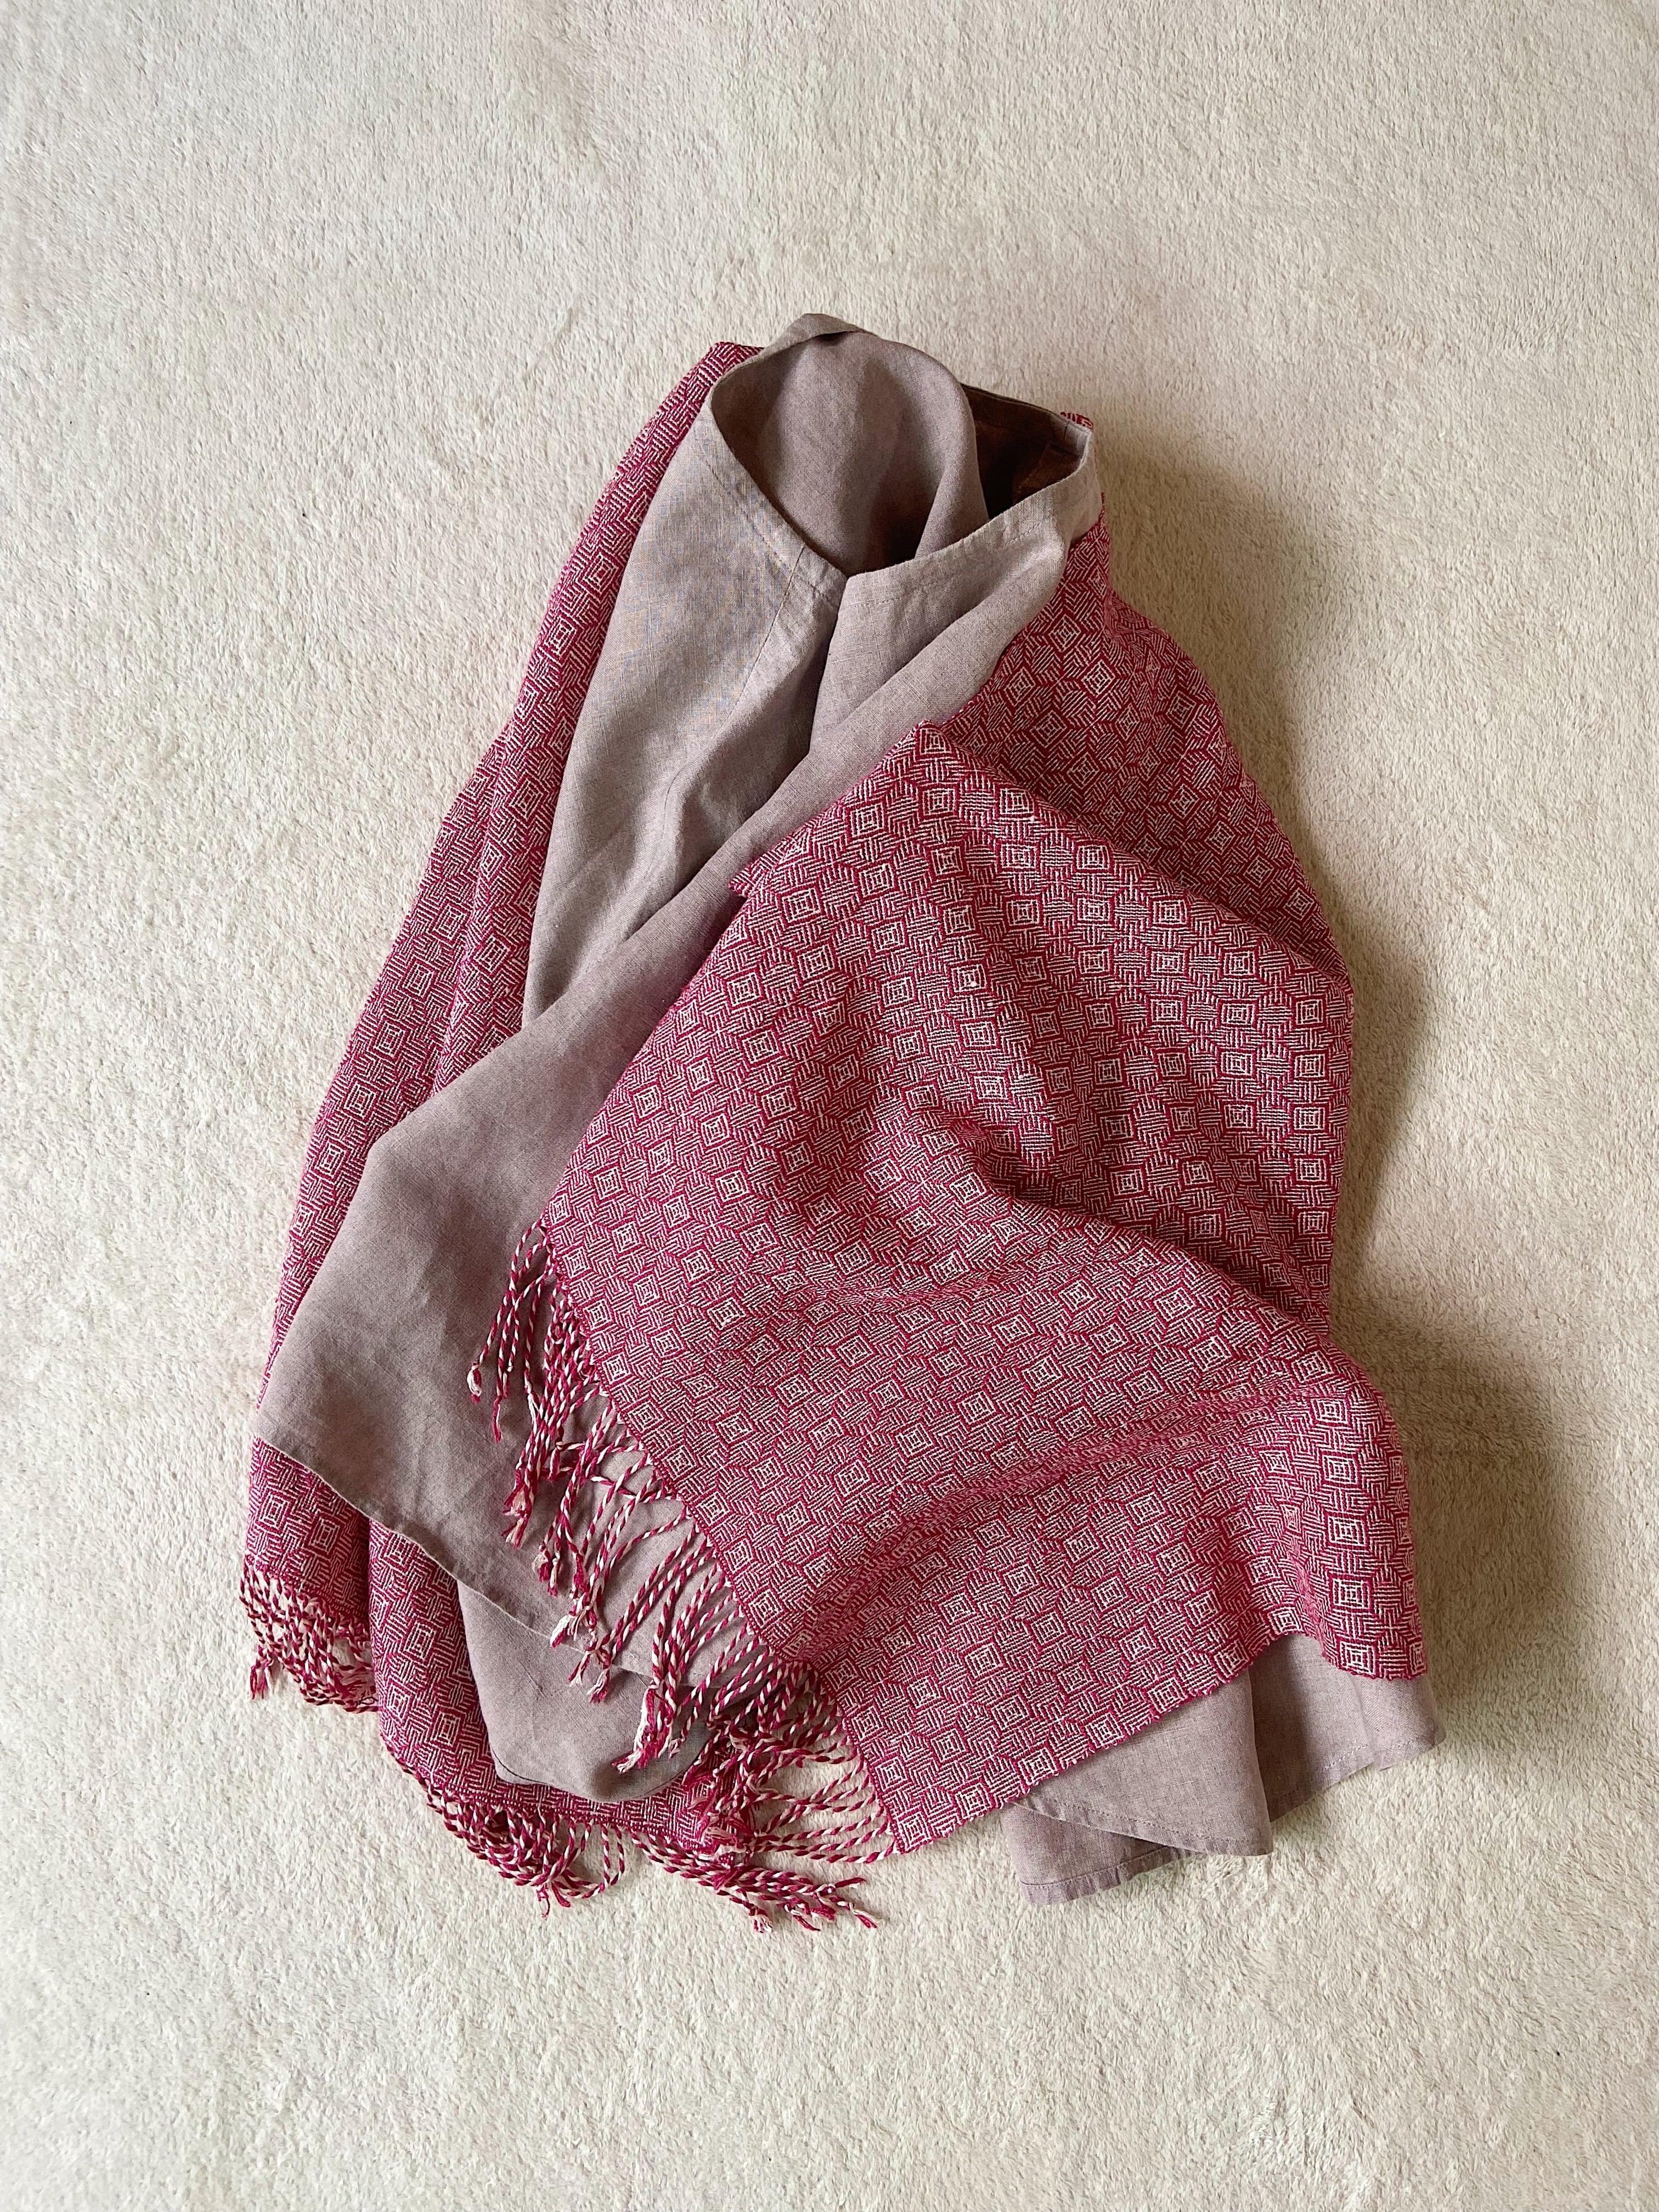 Hand-woven scarf / Bordeaux Clover  手織りシルクのショール ボルドークローバー